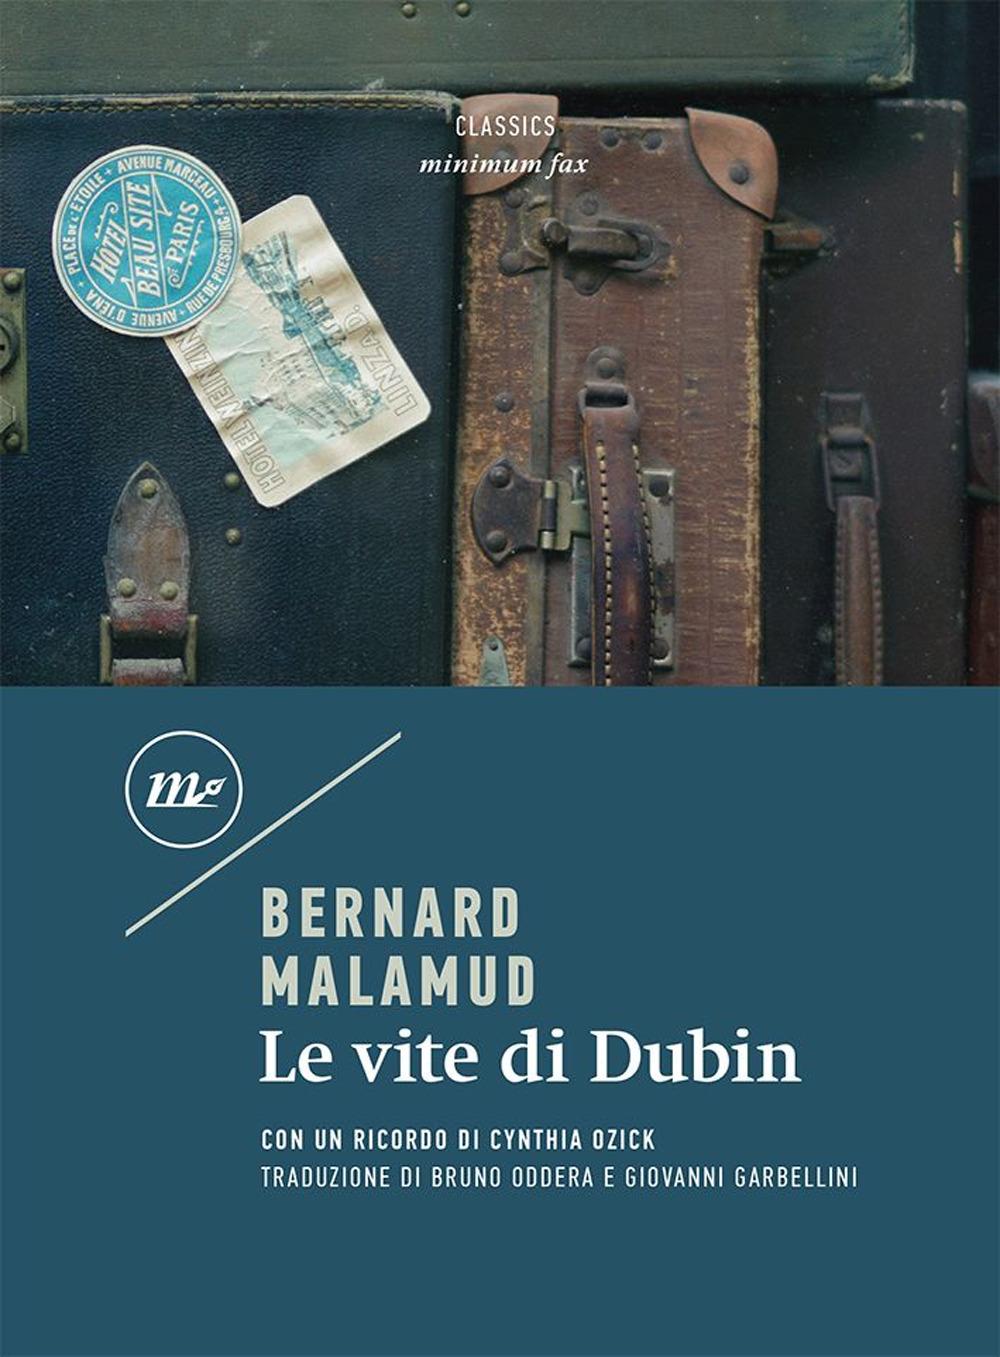 VITE DI DUBIN - 2a ed. (LE) - Malamud Bernard - 9788833891293